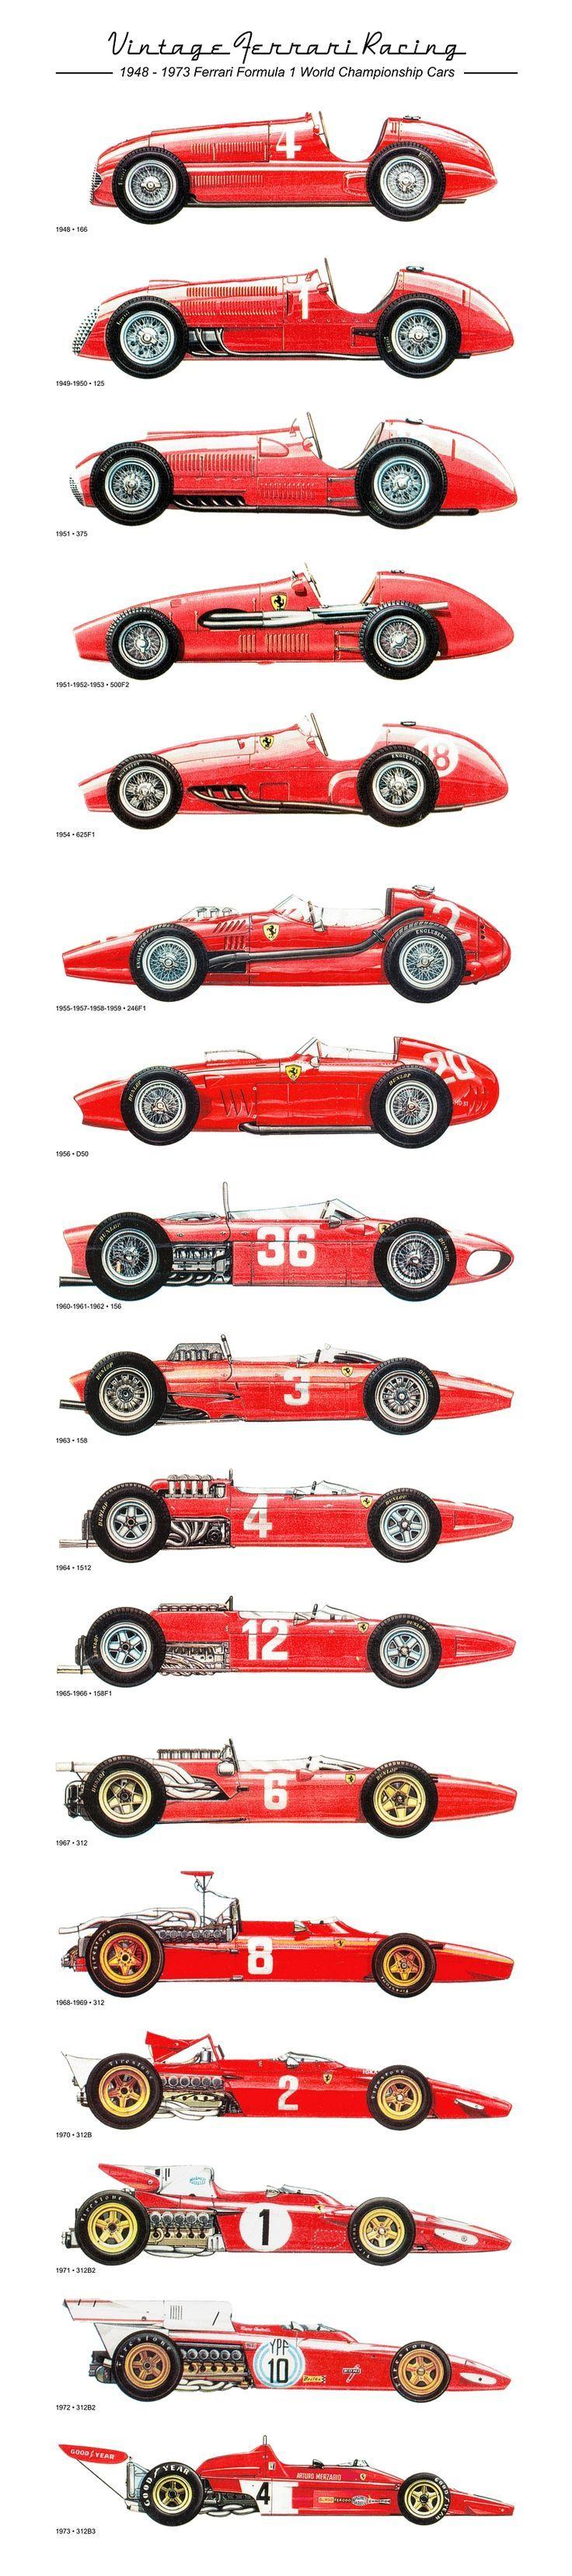 "Vintage Ferrari Racing poster. Beautiful ""small multiple"" set up that allows detailed comparisons - https://www.luxury.guugles.com/vintage-ferrari-racing-poster-beautiful-small-multiple-set-up-that-allows-detailed-comparisons/"